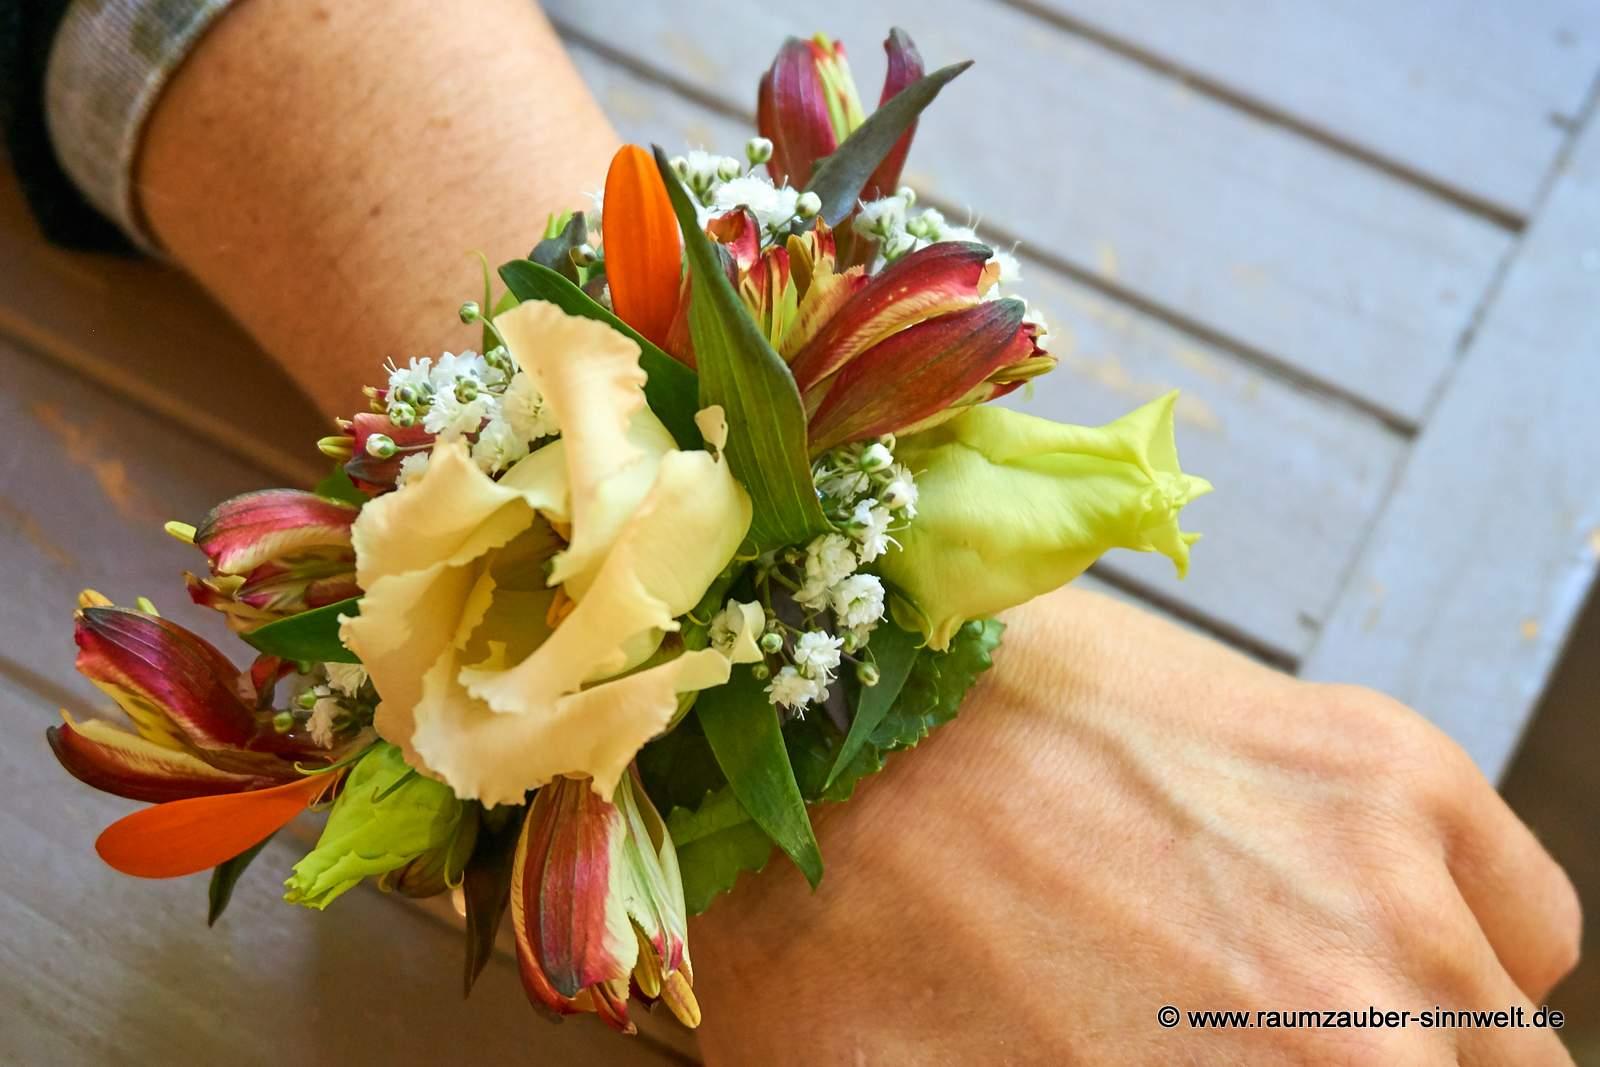 Armband mit Alstromerien und Eustomablüten.